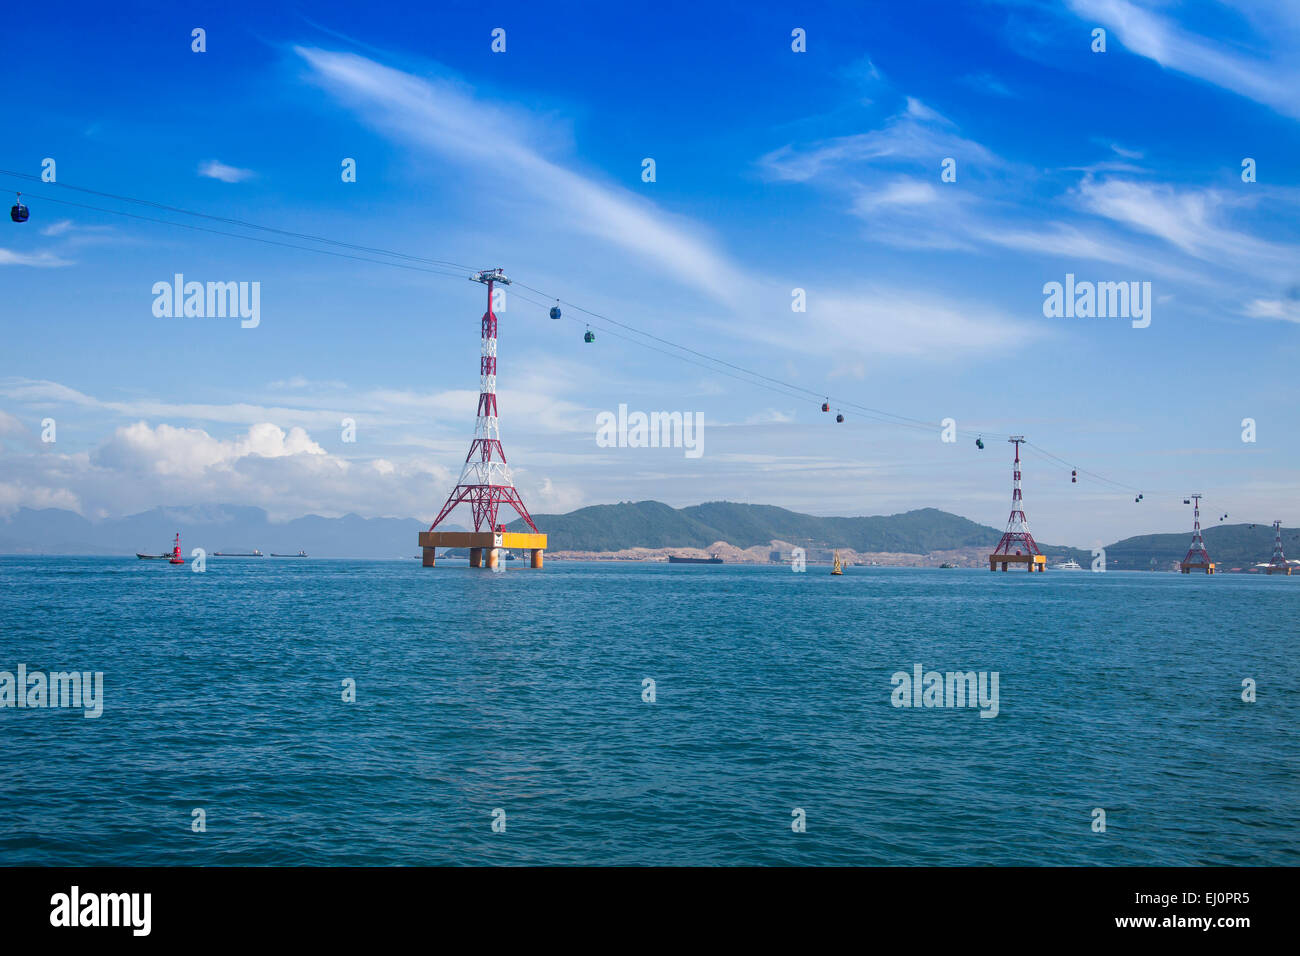 Vinpearl, island, Nha, Trang, South Vietnam, architecture, water, gondola, cable railway, transportation, Vietnam, - Stock Image